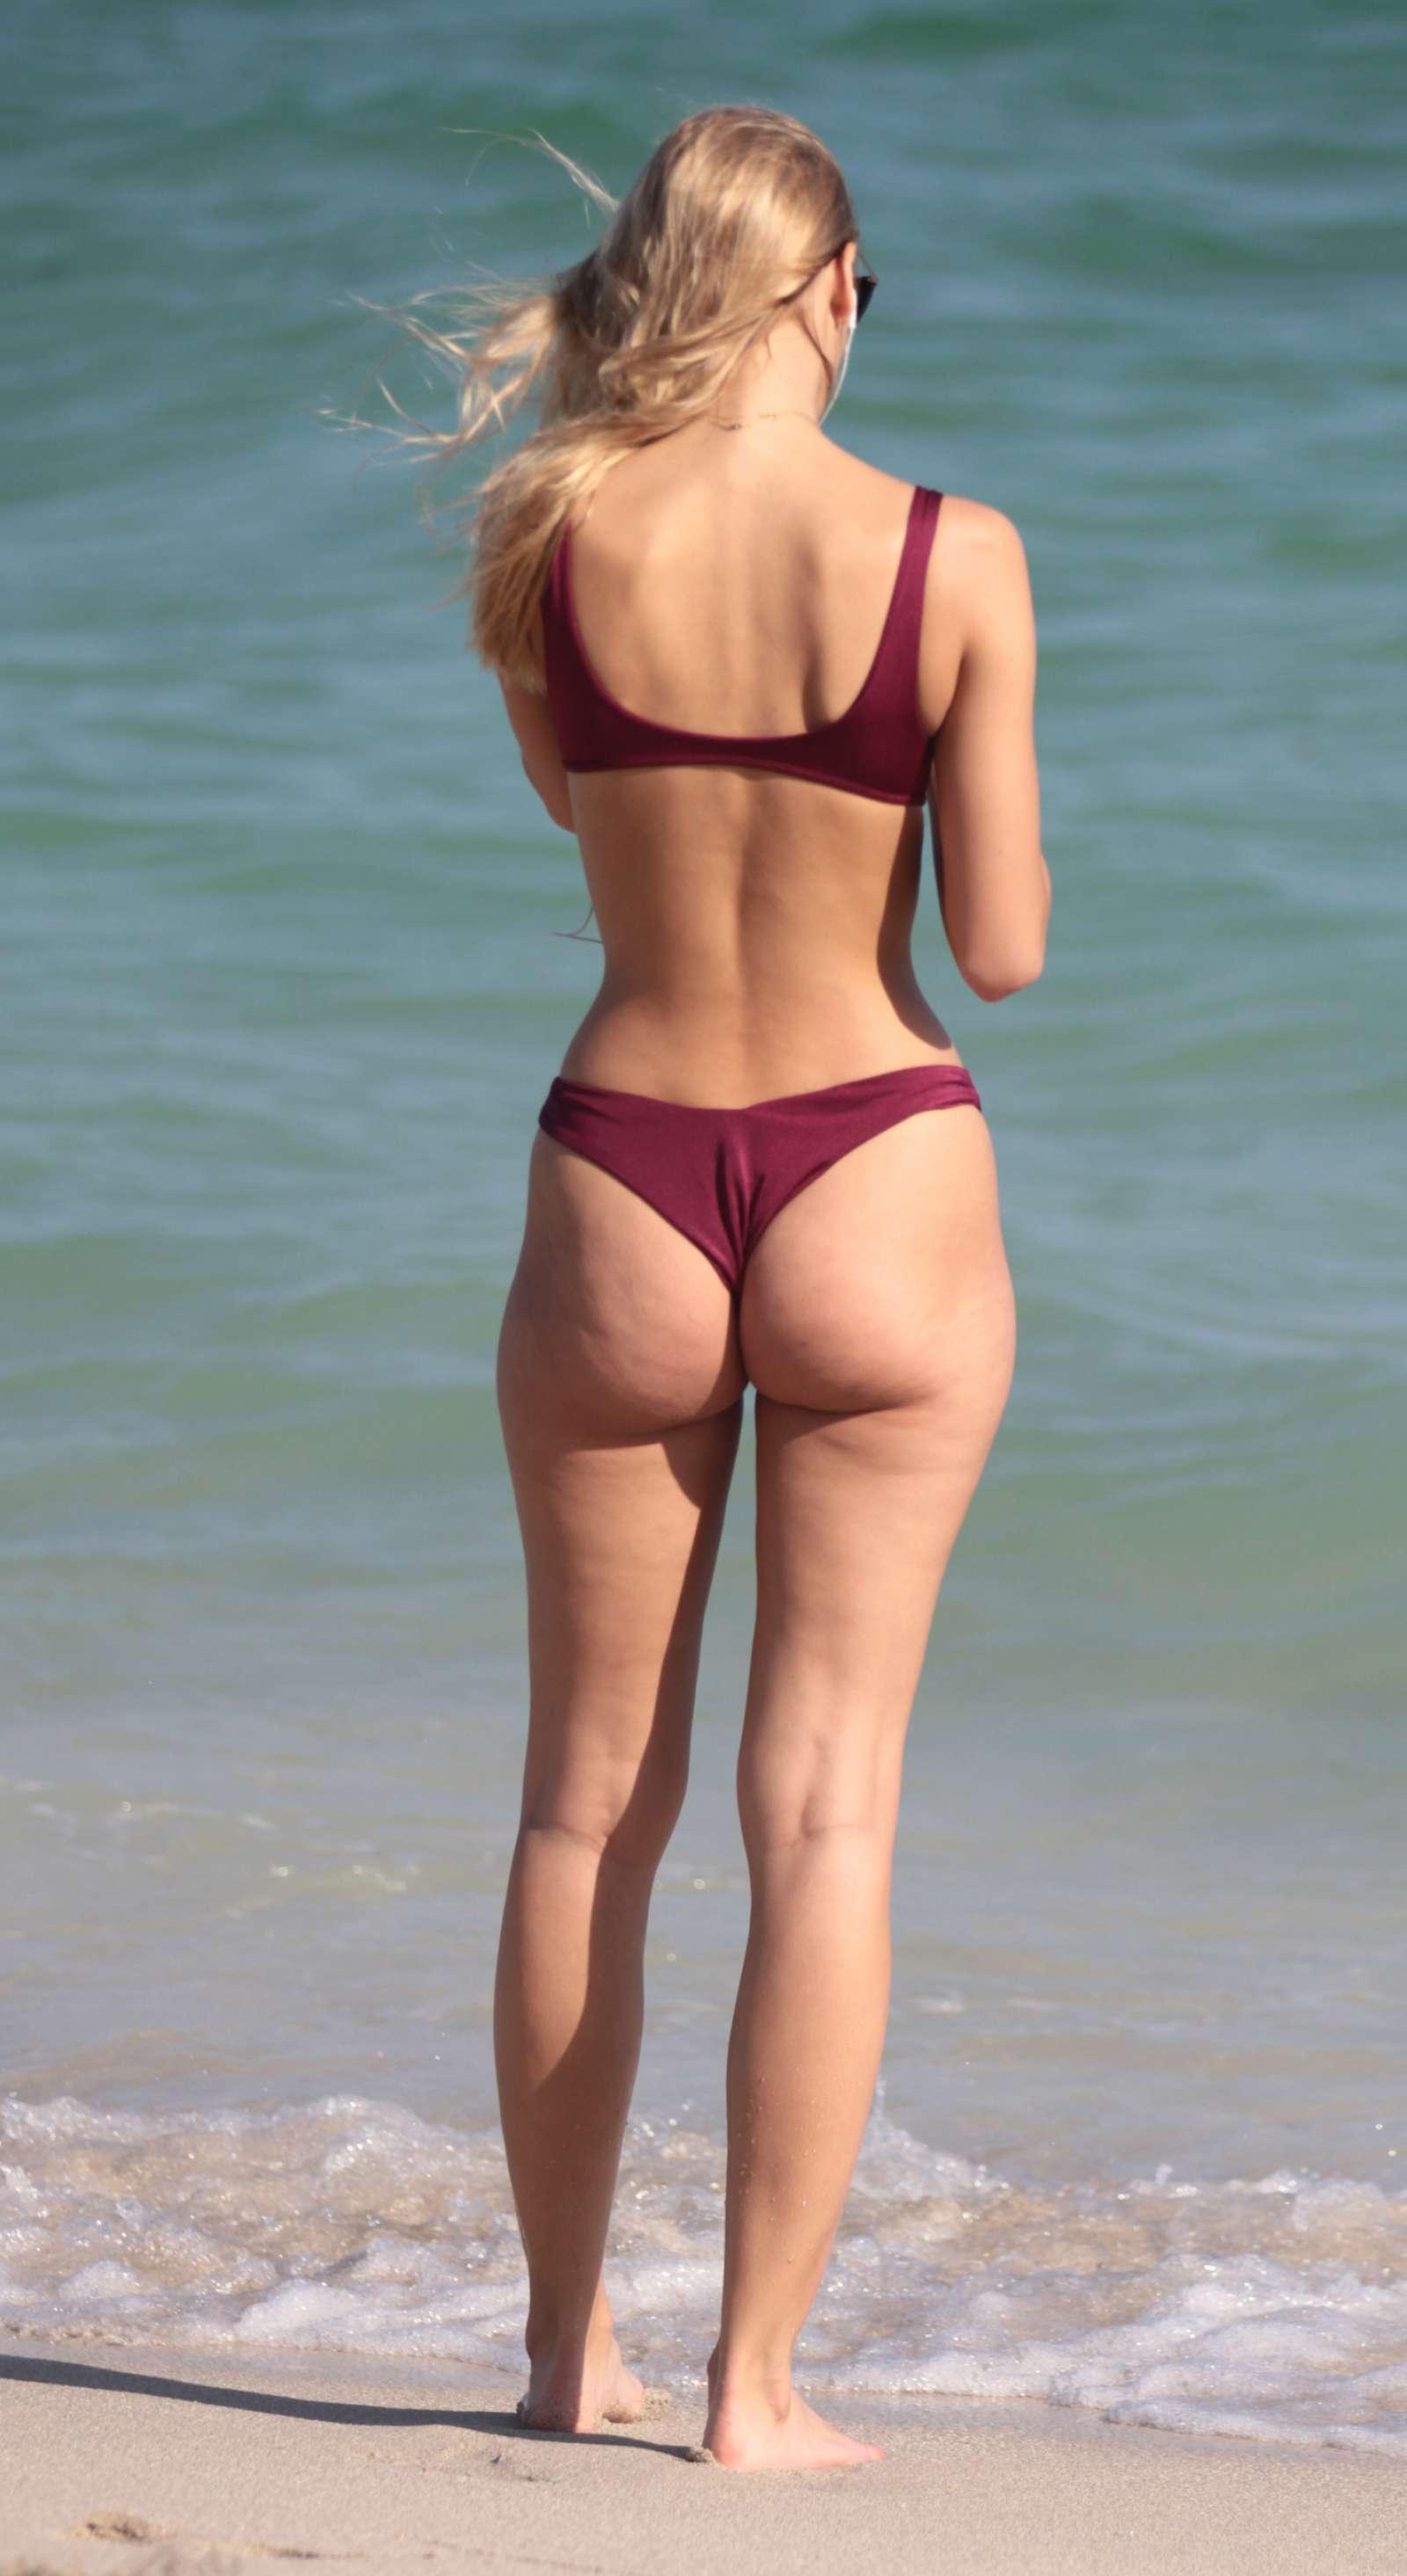 Paparazzi Mariya Melnyk nude (98 photos), Pussy, Cleavage, Selfie, in bikini 2019